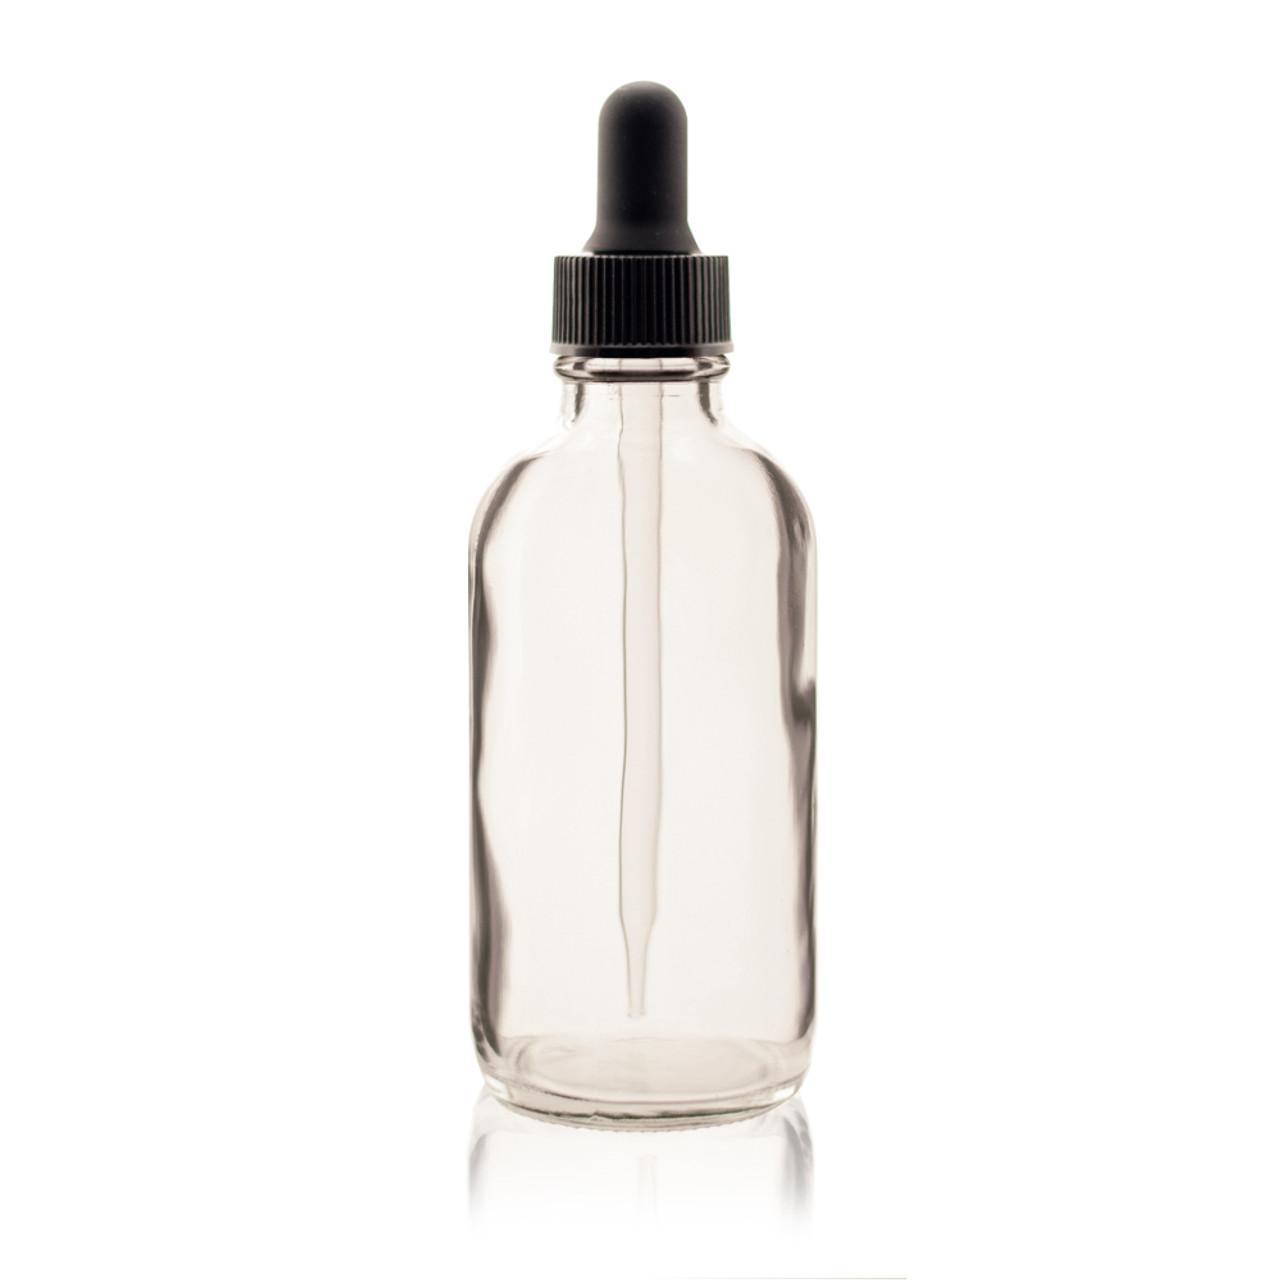 ebbdd9f9c9a5 4 oz CLEAR Glass Bottle - w/ Black Regular Glass Dropper